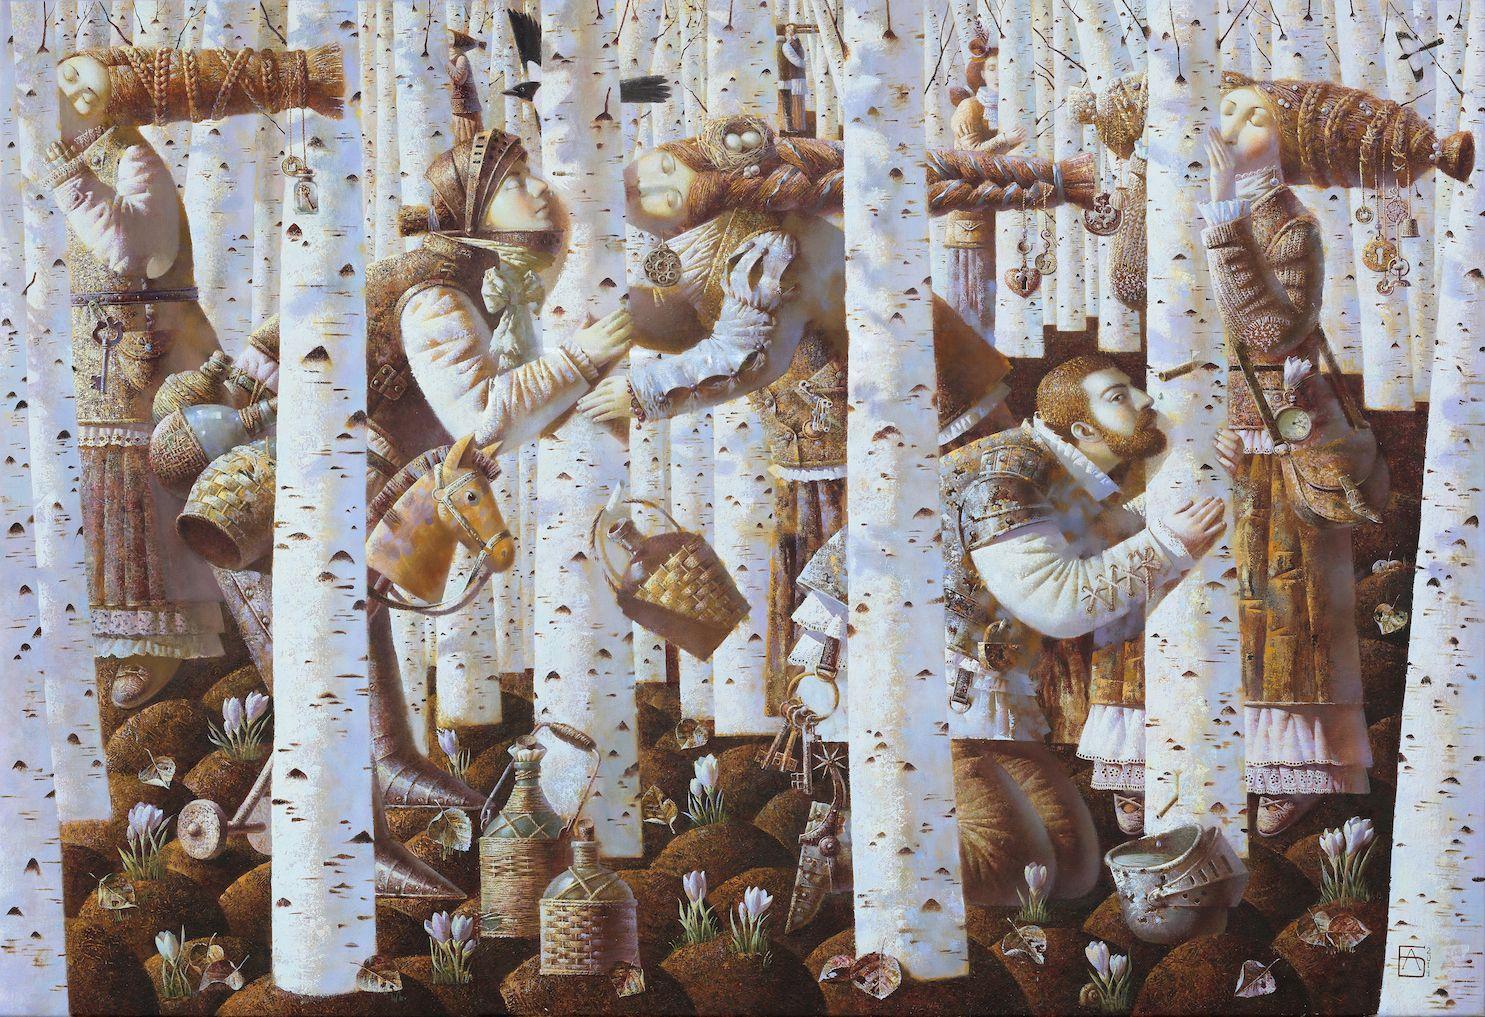 Anna Berezovskaya_Kissing the Birch